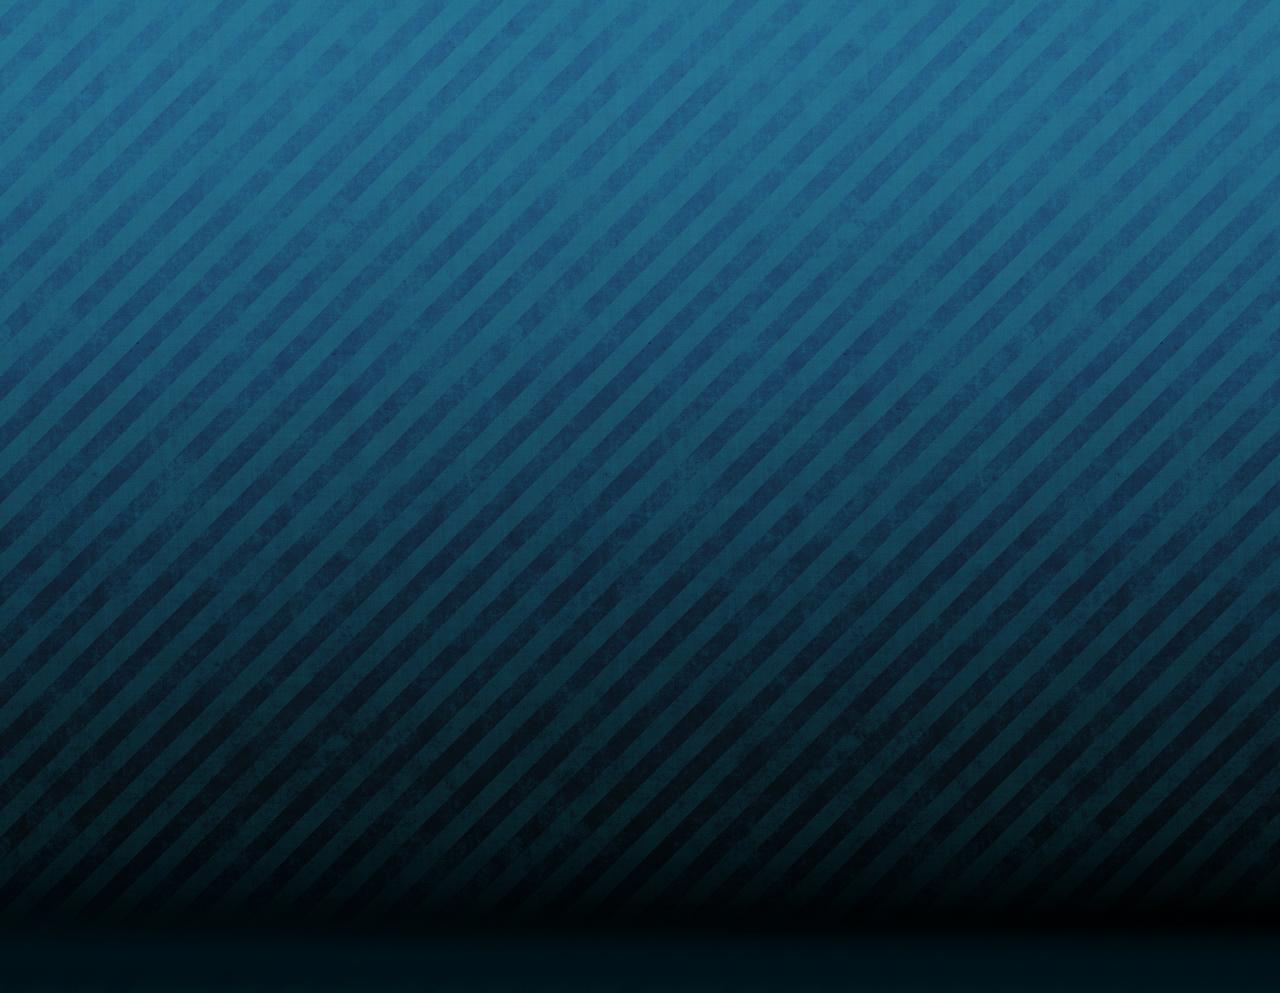 fondos para p ginas web fondos de pantalla